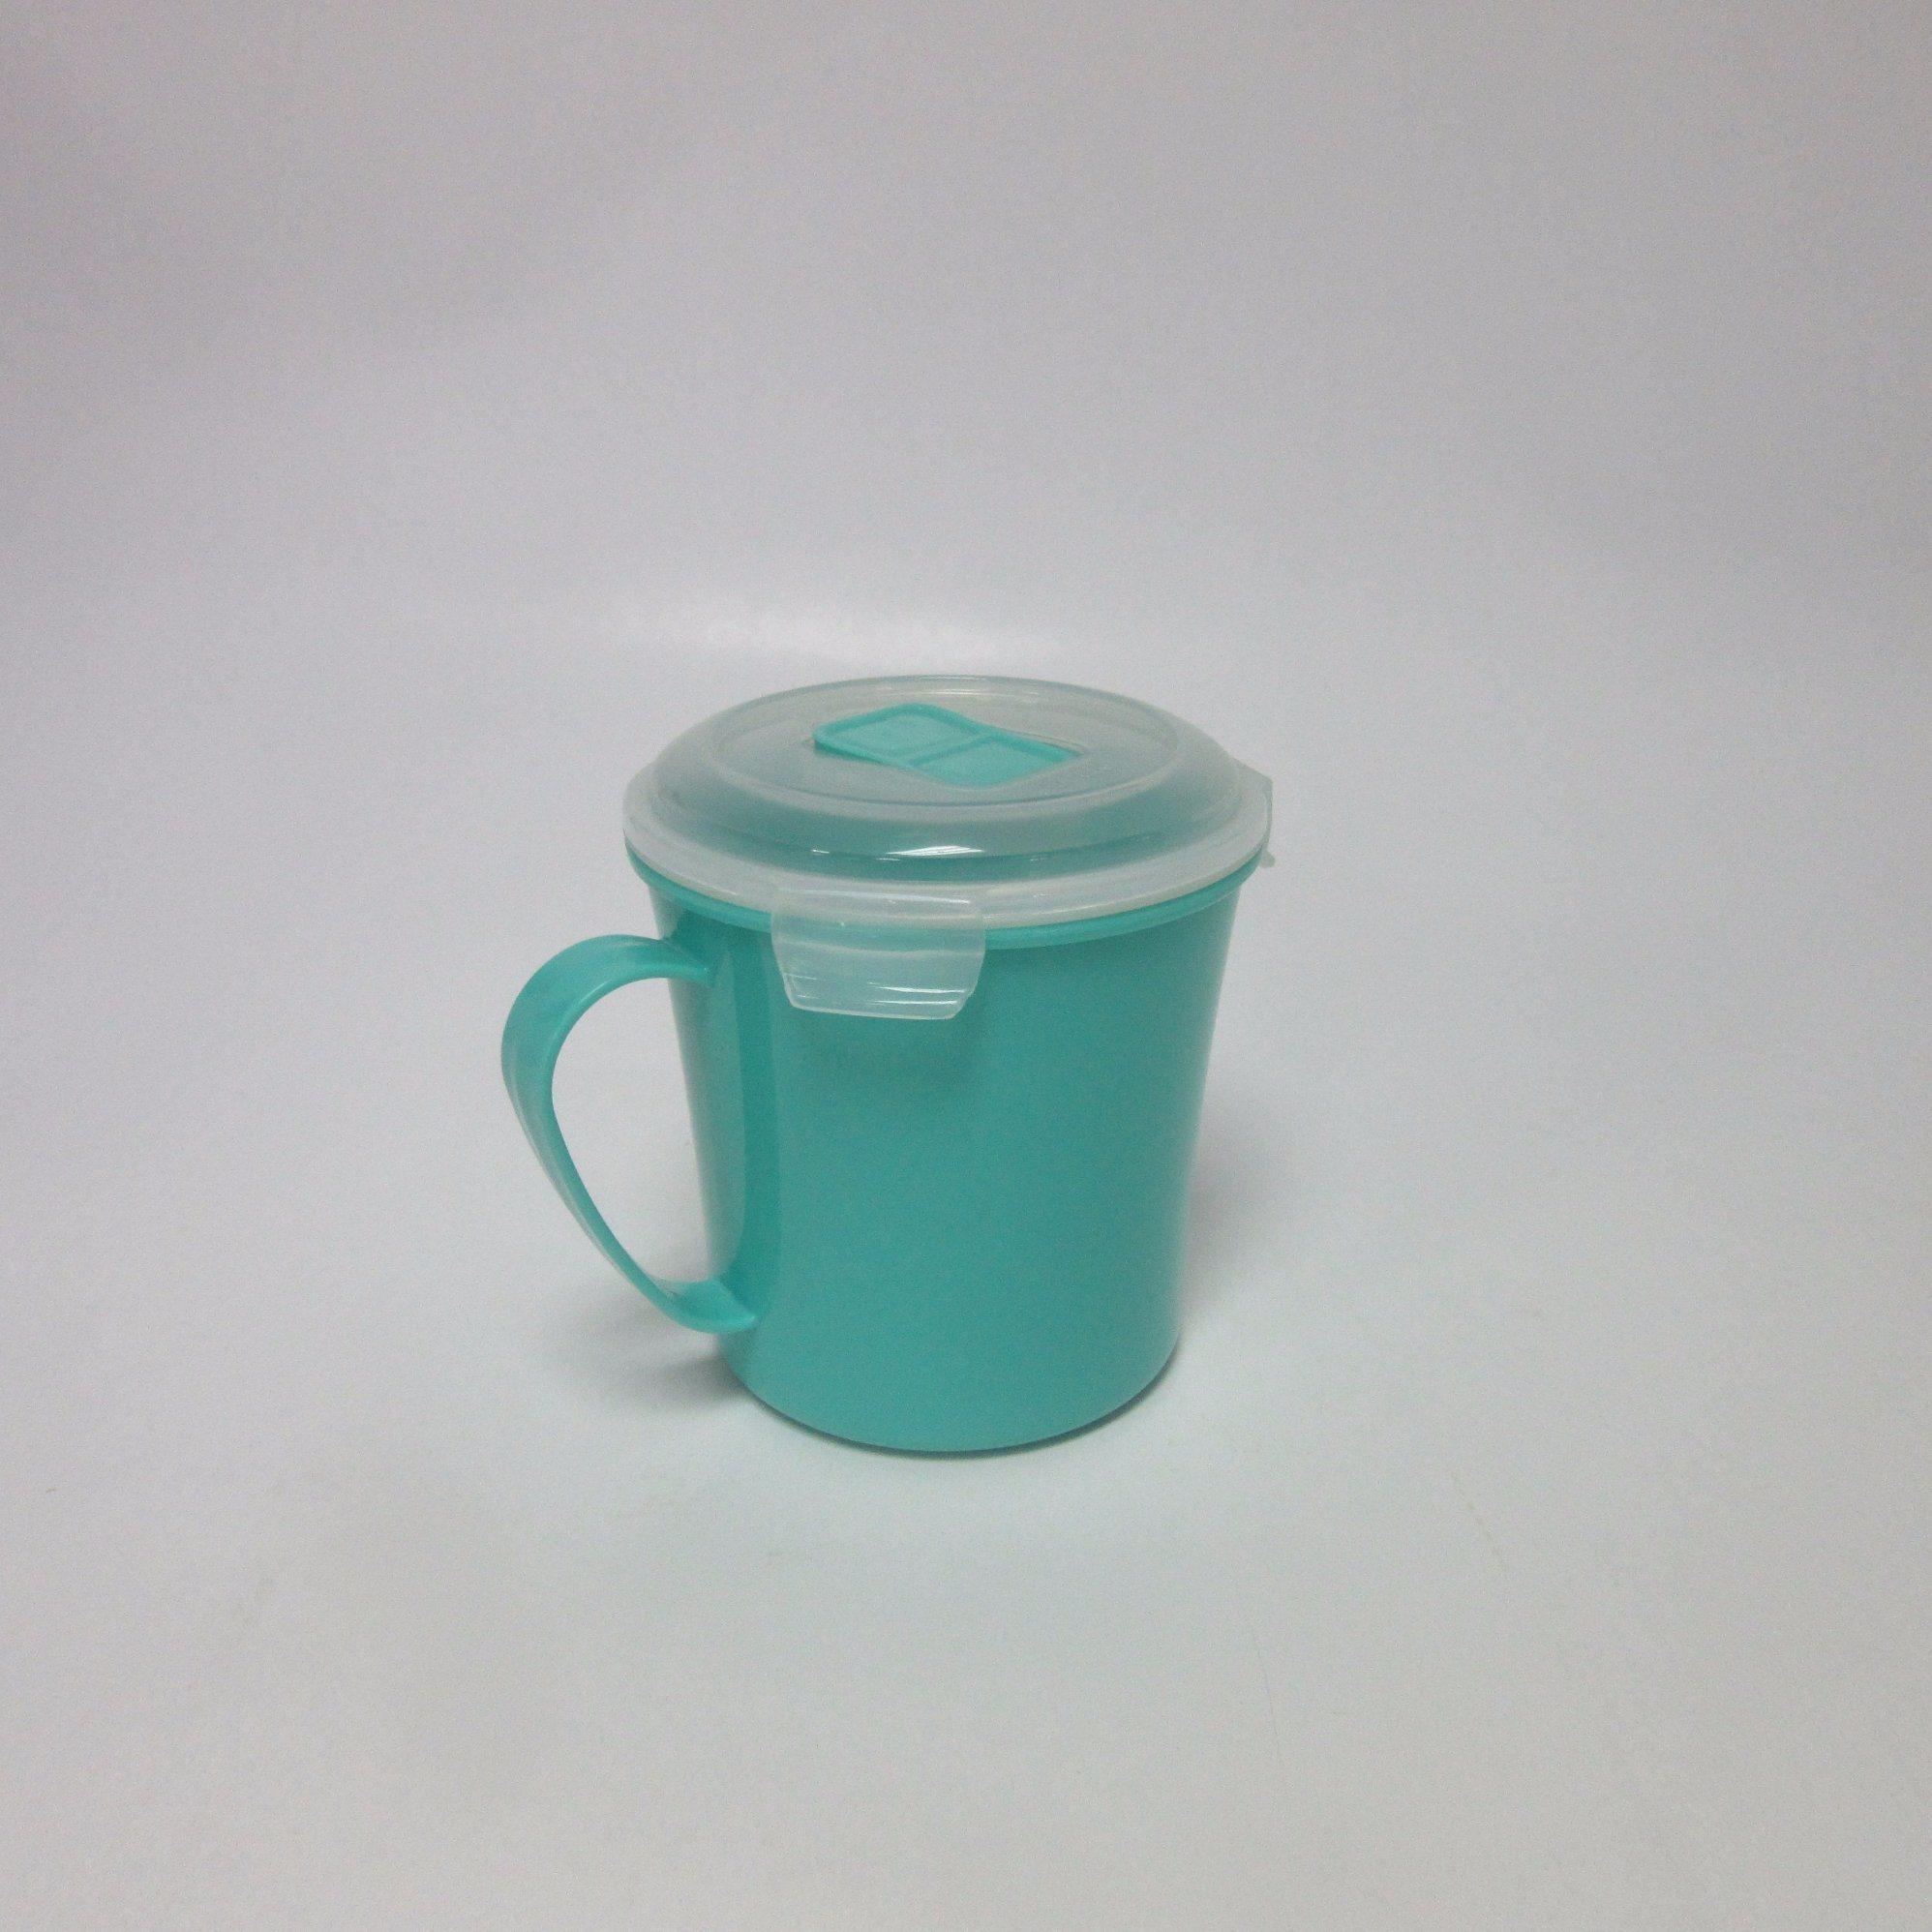 PP Noodle Container Plastic Storage